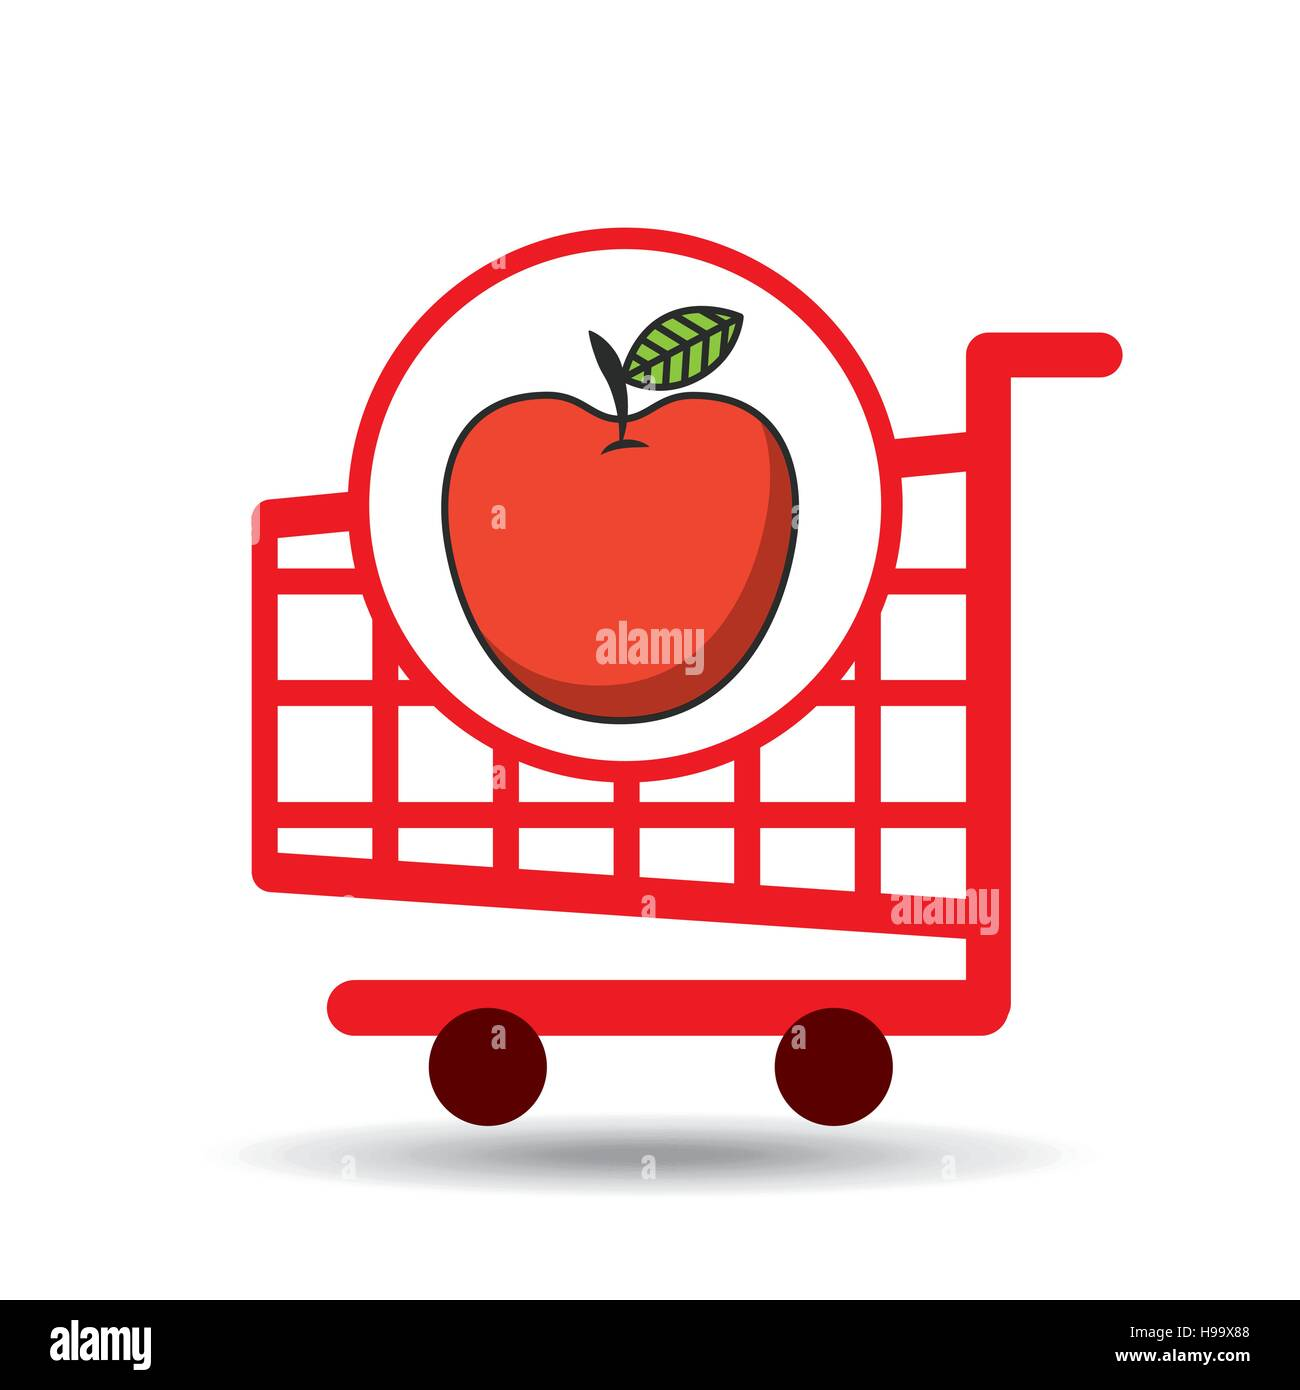 apple ecommerce shopping cart graphic vector illustration eps 10 - Stock Image